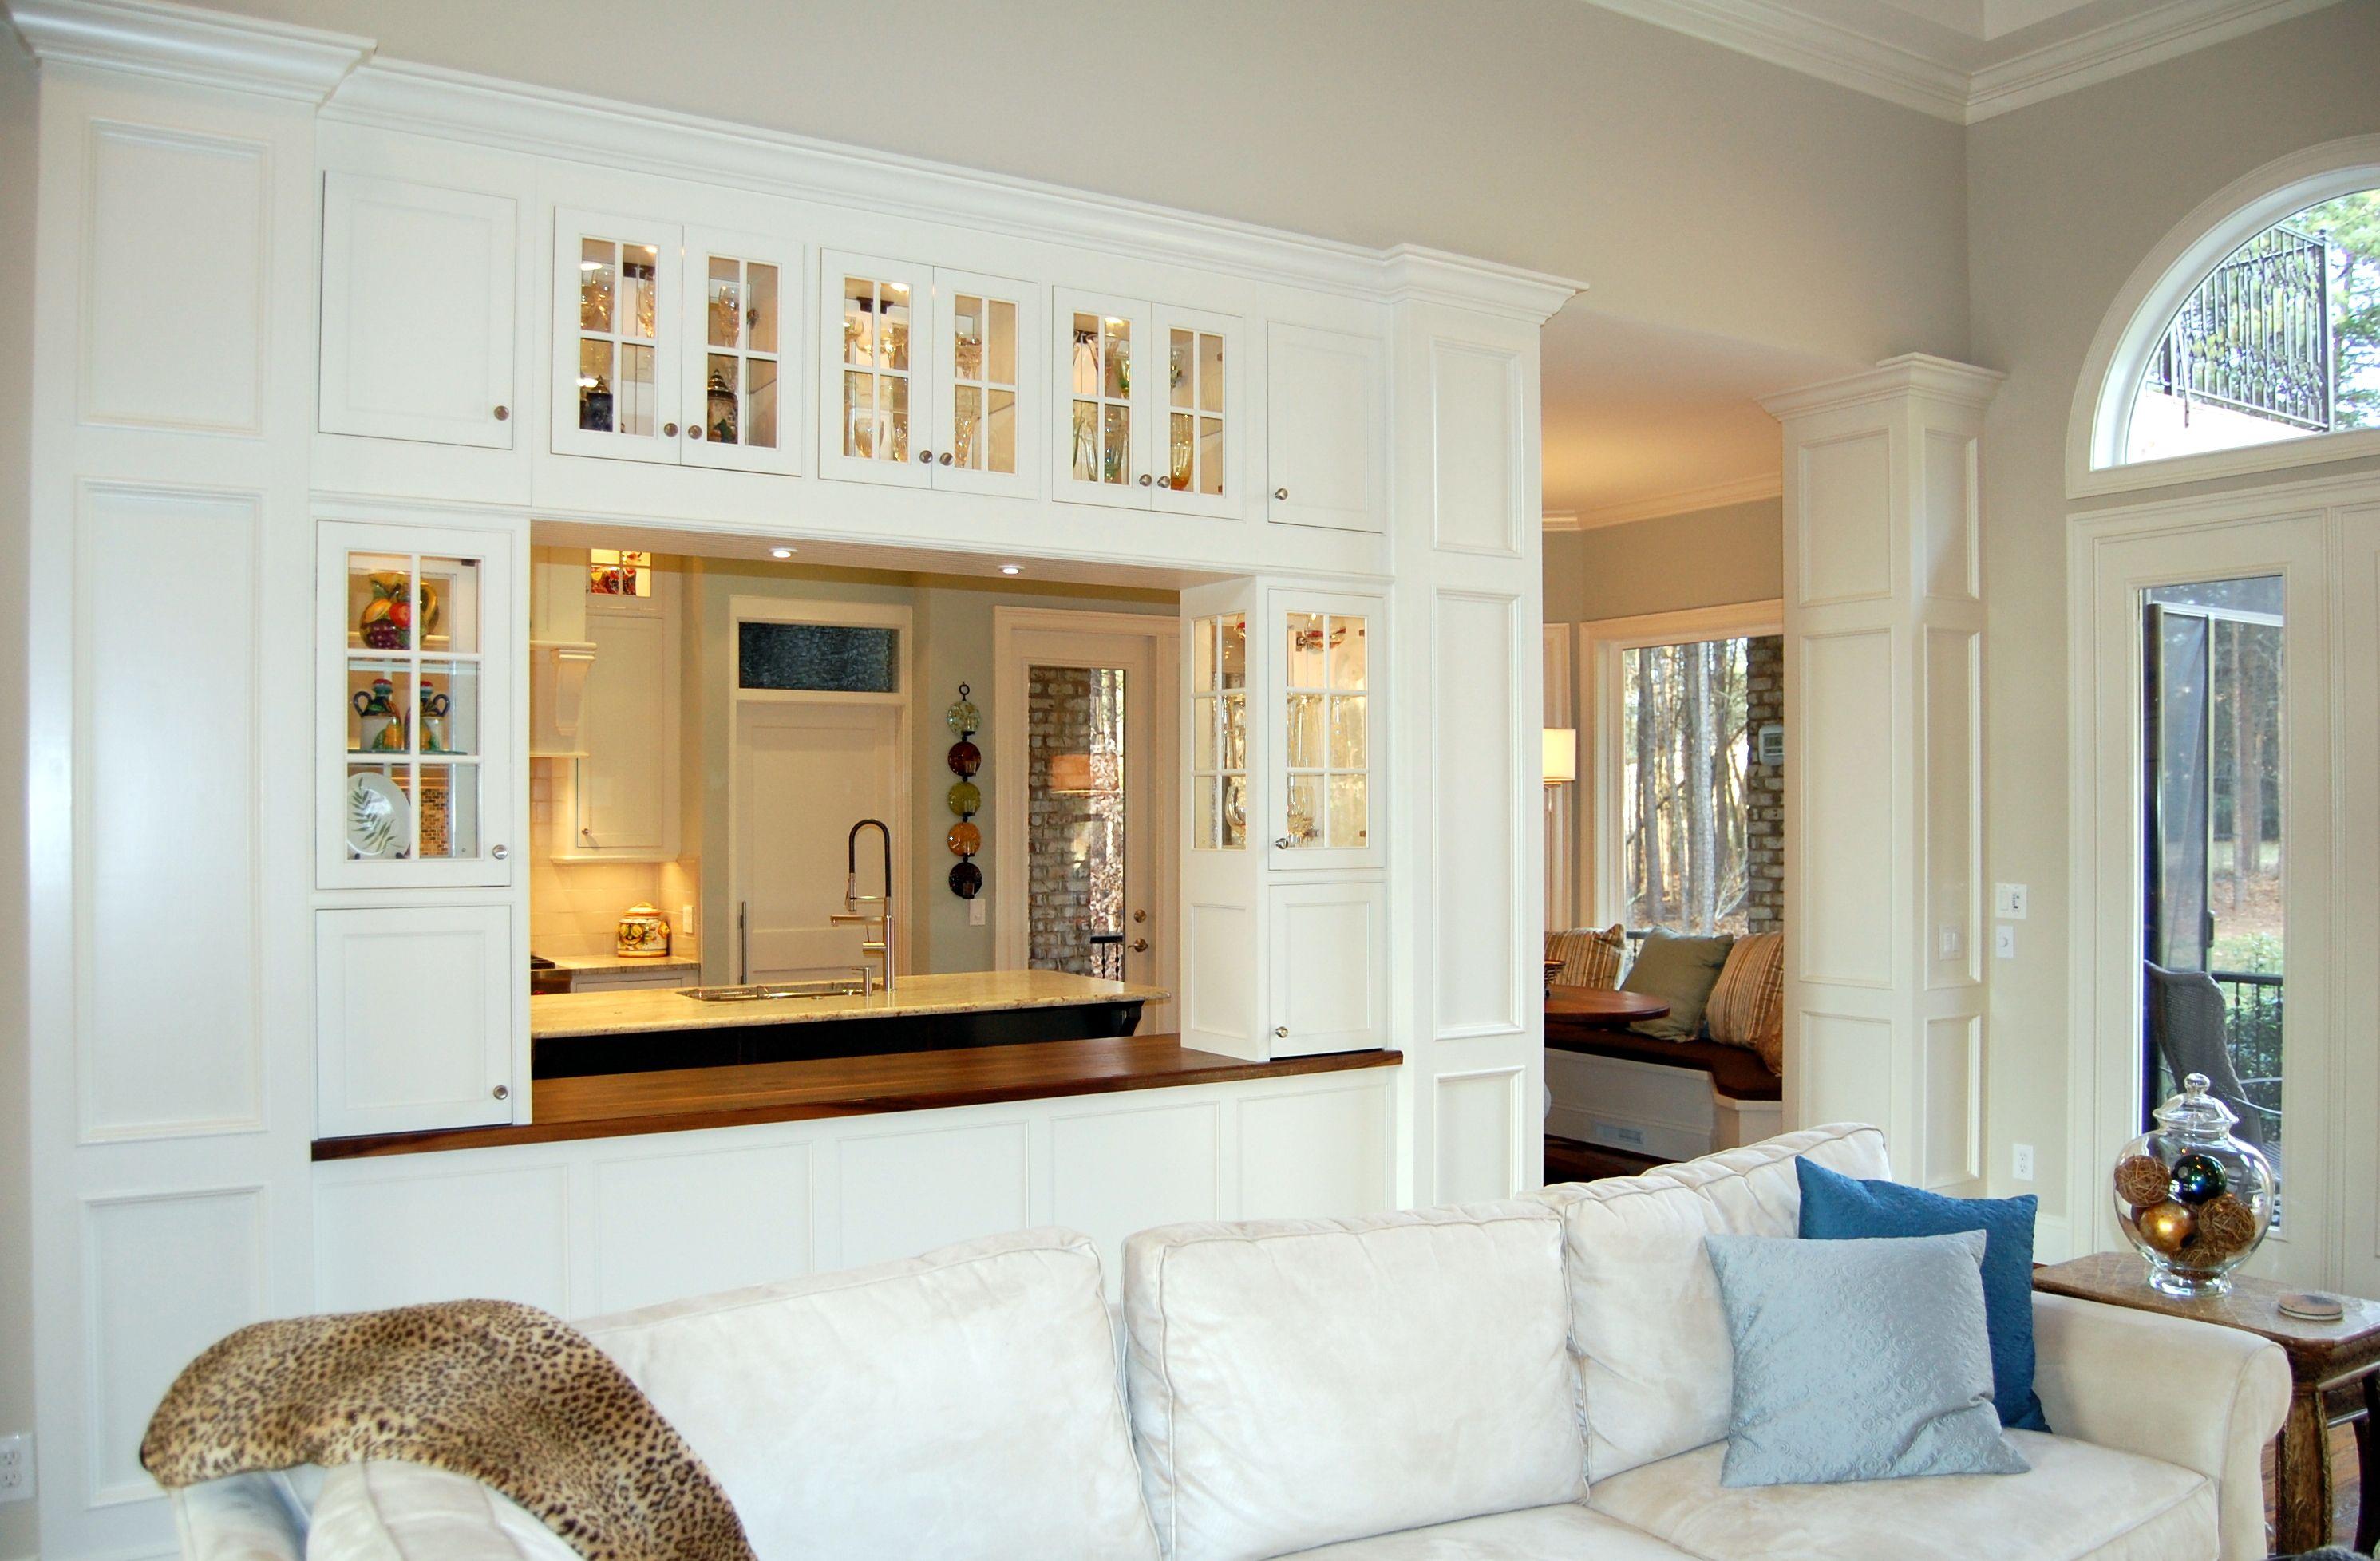 Open Divider Between Kitchen And Living Room Living Room Kitchen